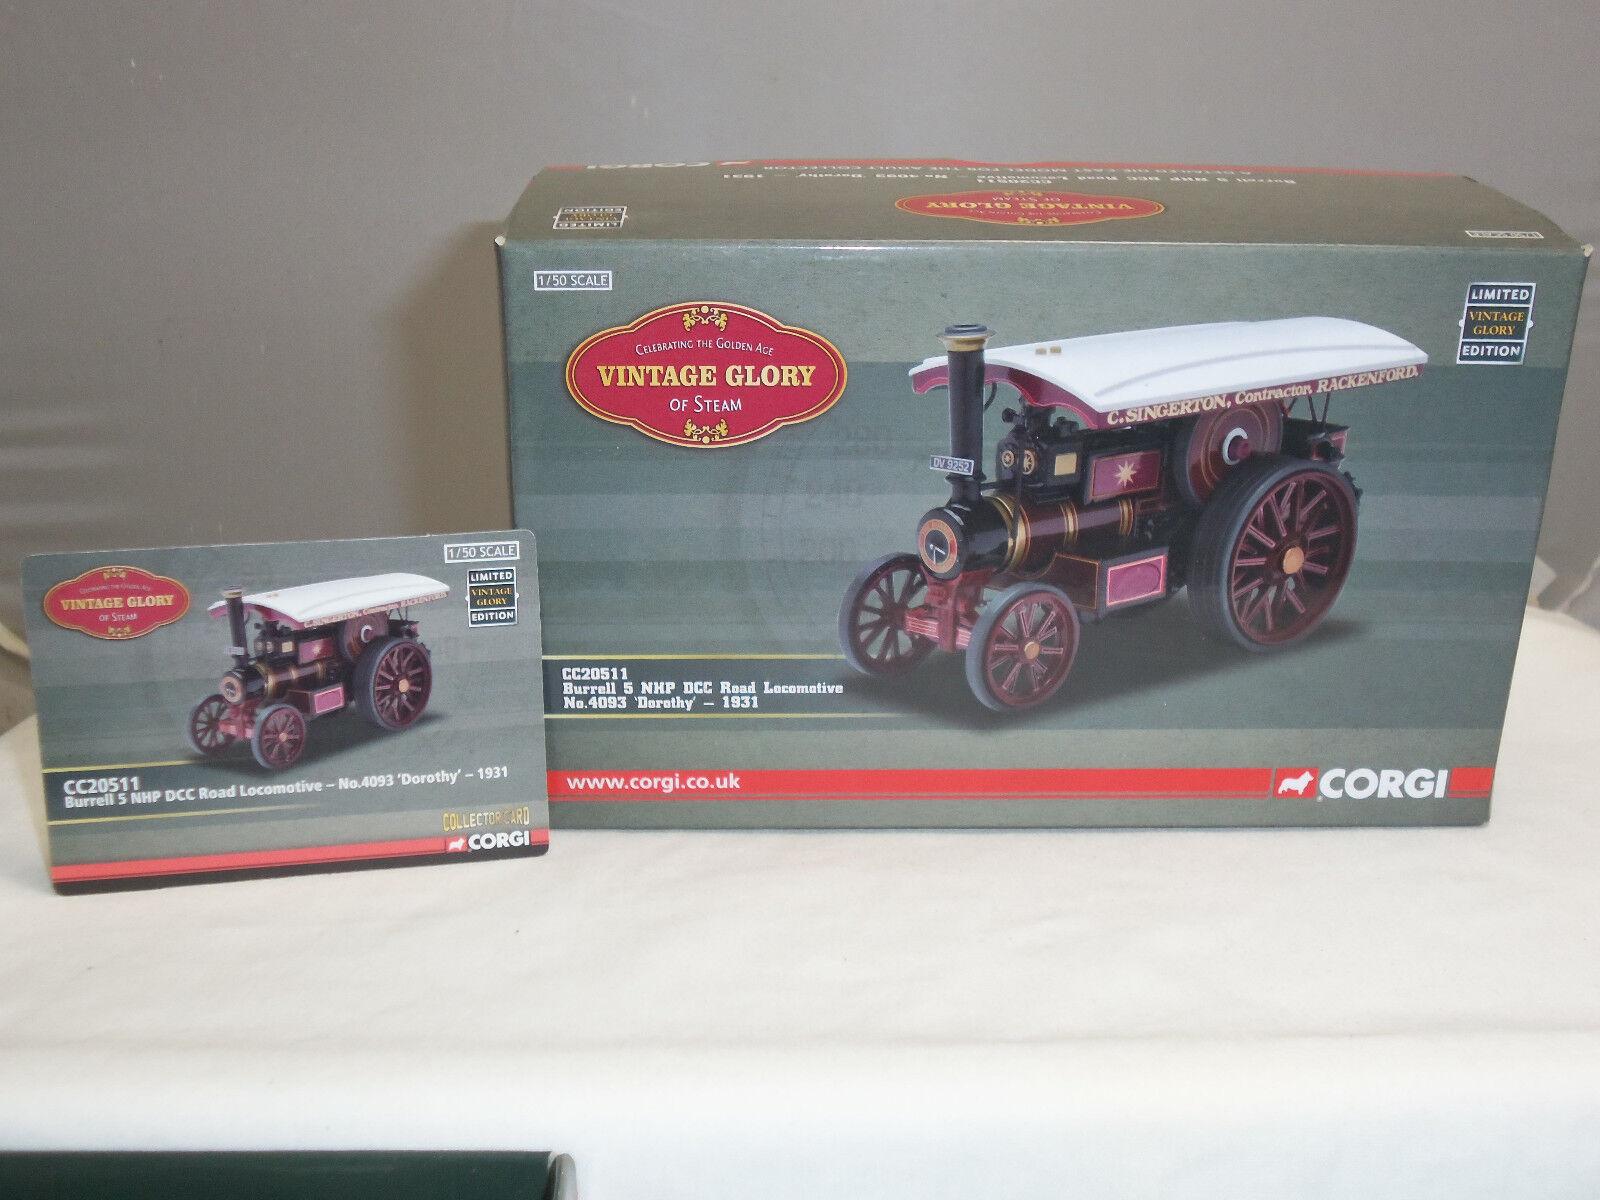 CORGI CC20511 BURRELL STEAM ENGINE DIECAST MODEL DgoldTHY ROAD ROAD ROAD LOCOMOTIVE 827288